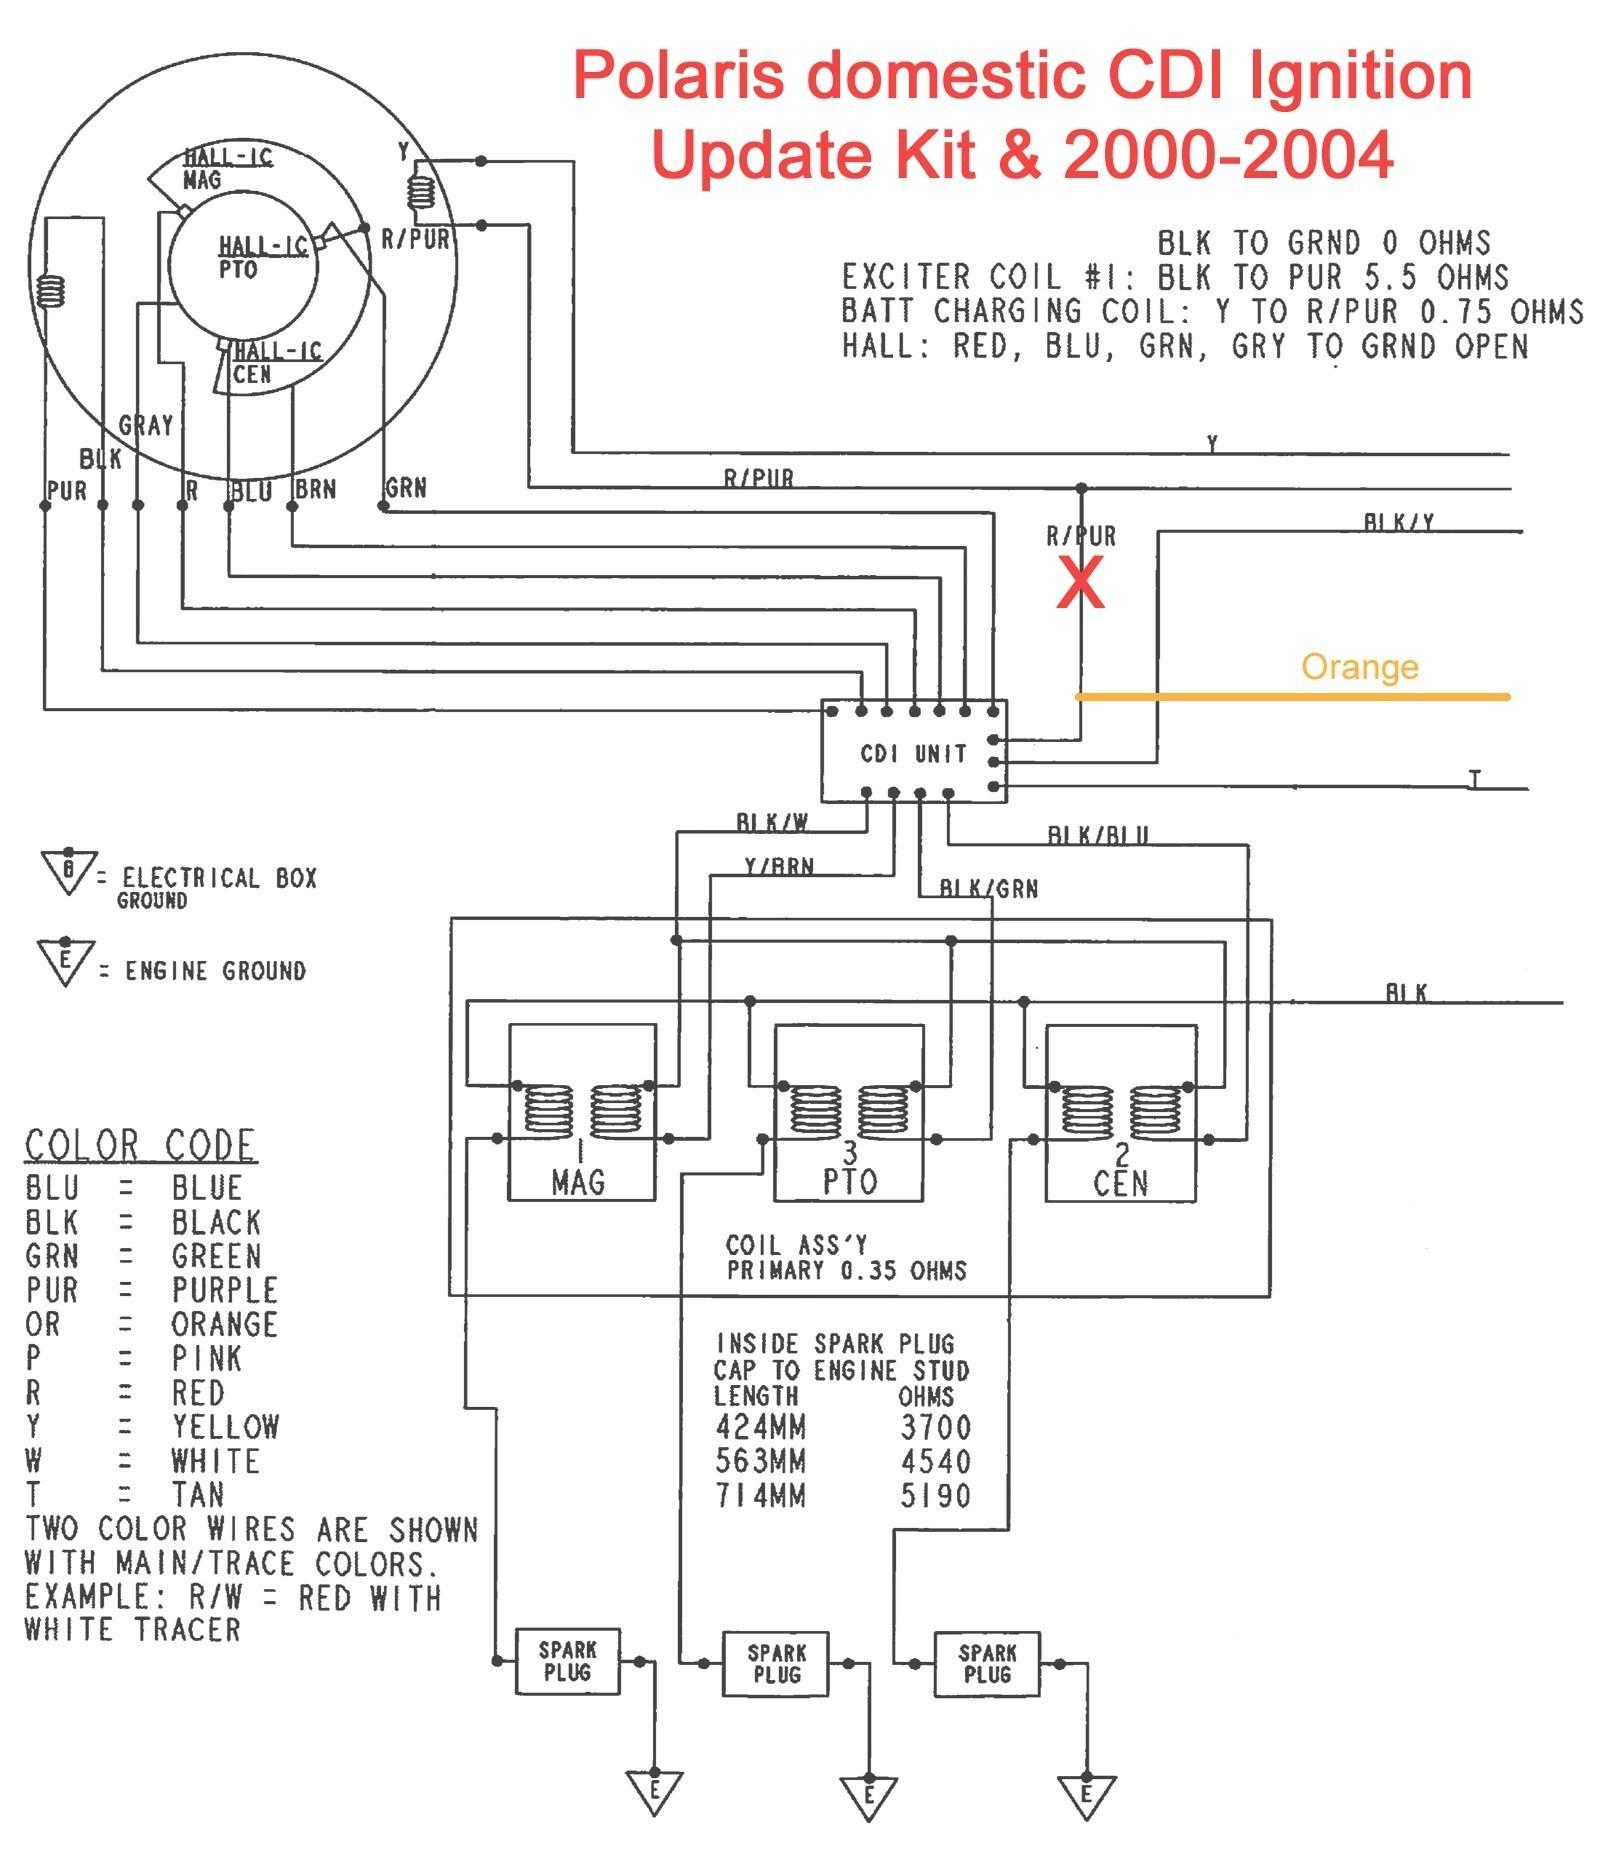 425 Polaris Wiring Diagram Block Schematic Electronic Pioneer Deh 2001 Scrambler 90 Reviewmotorscorhreviewmotorsco At Selfit